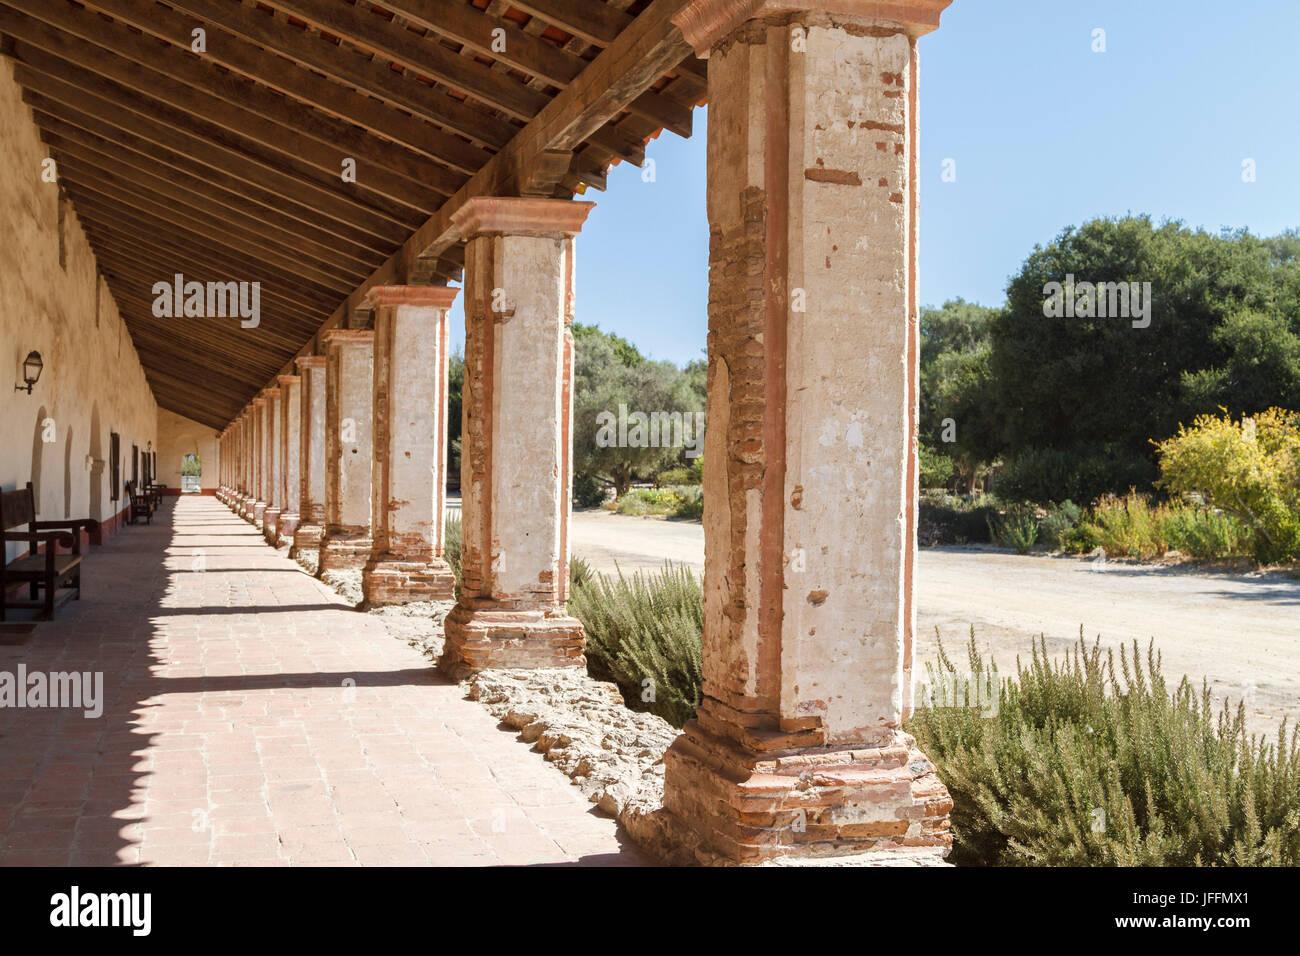 La Purisima Mission State Historic Park, Lompoc, California - Stock Image